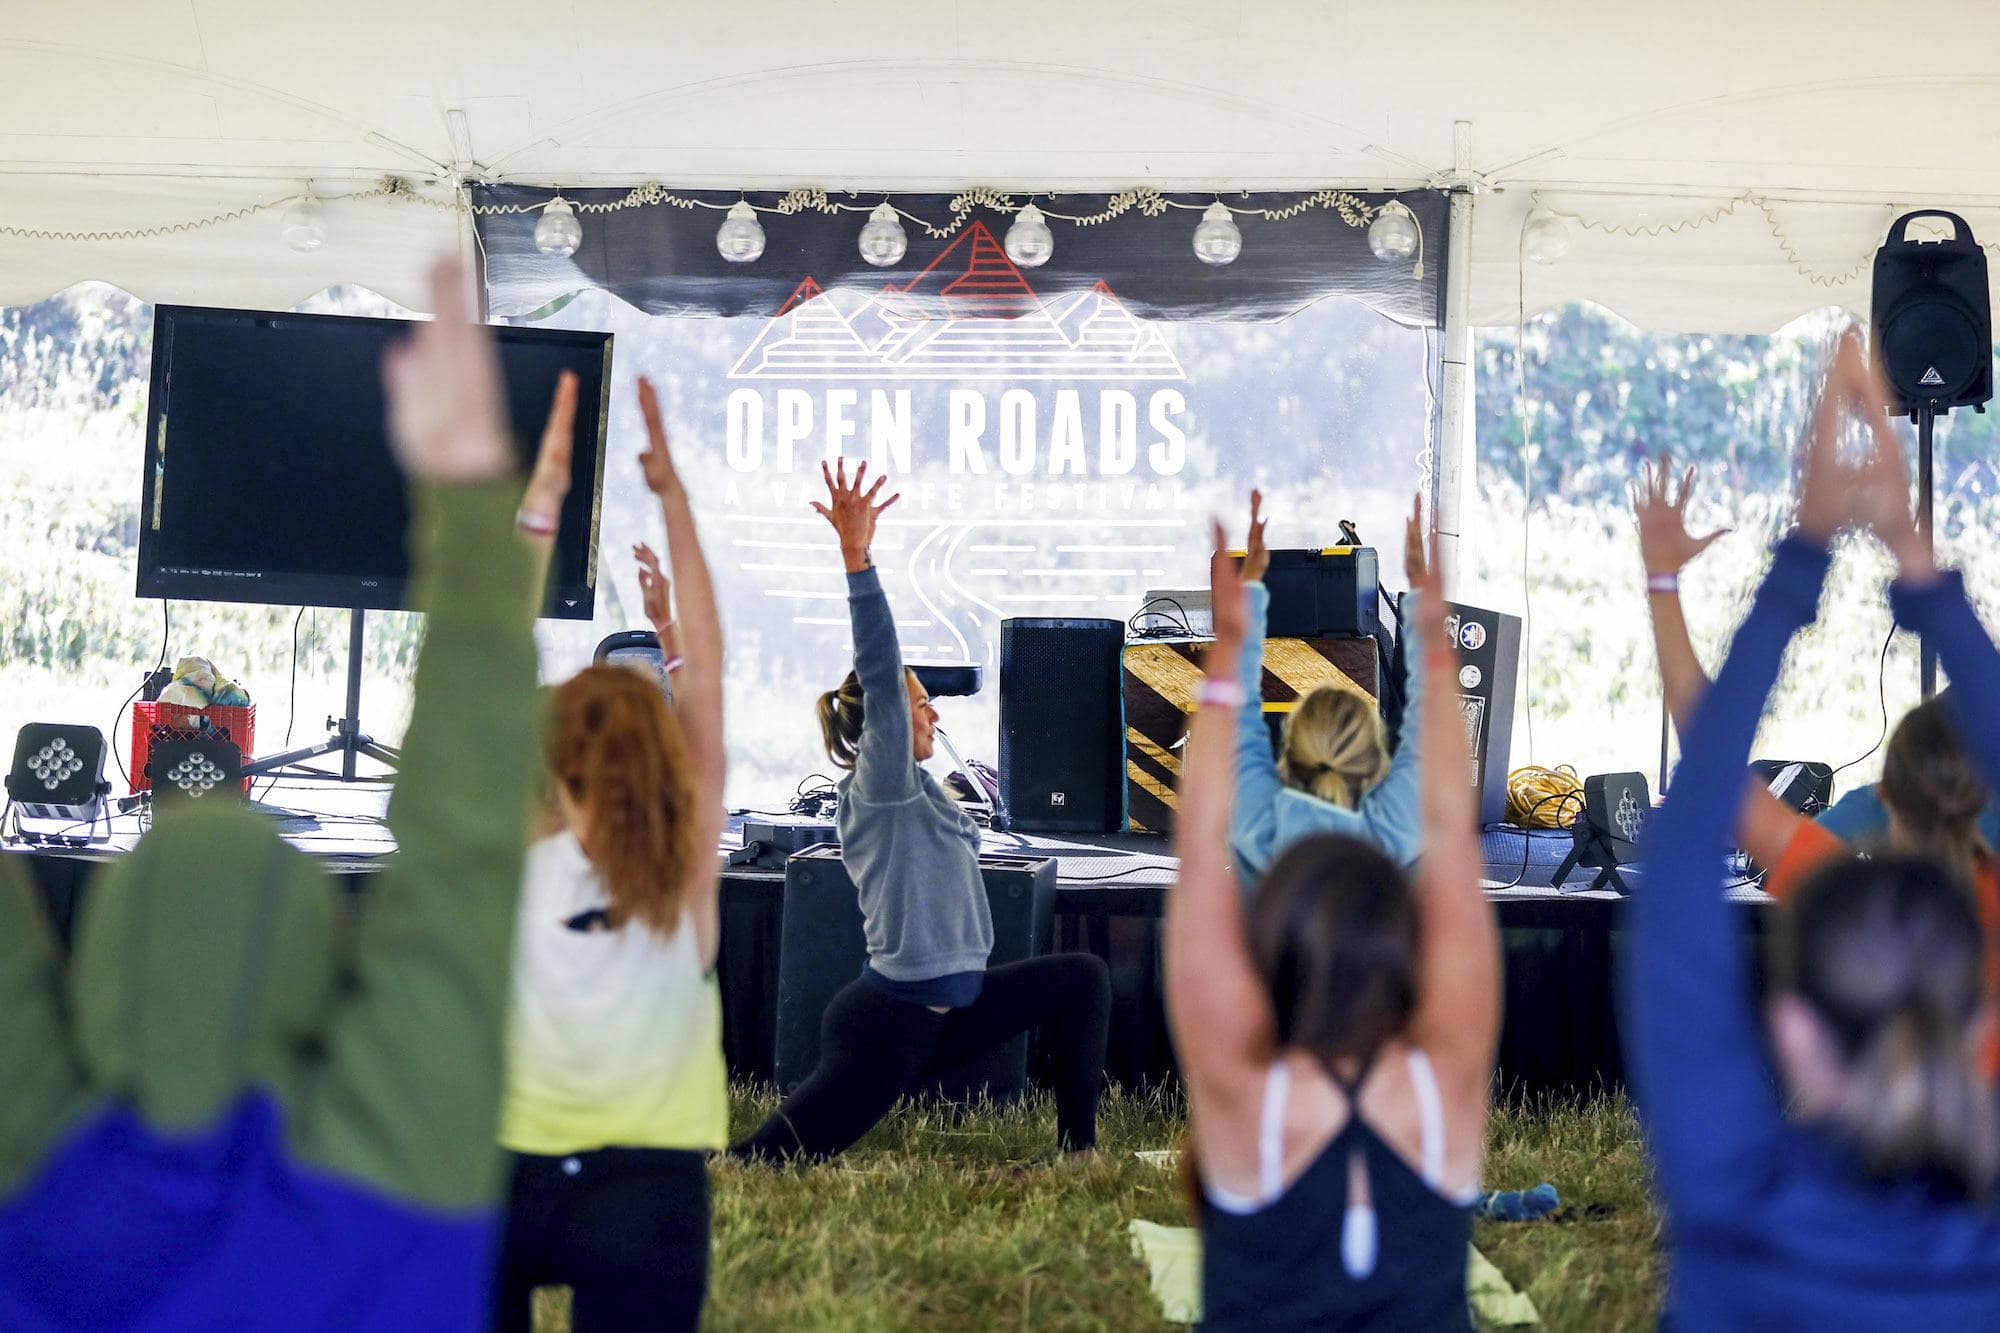 Yoga at Open Roads Fest